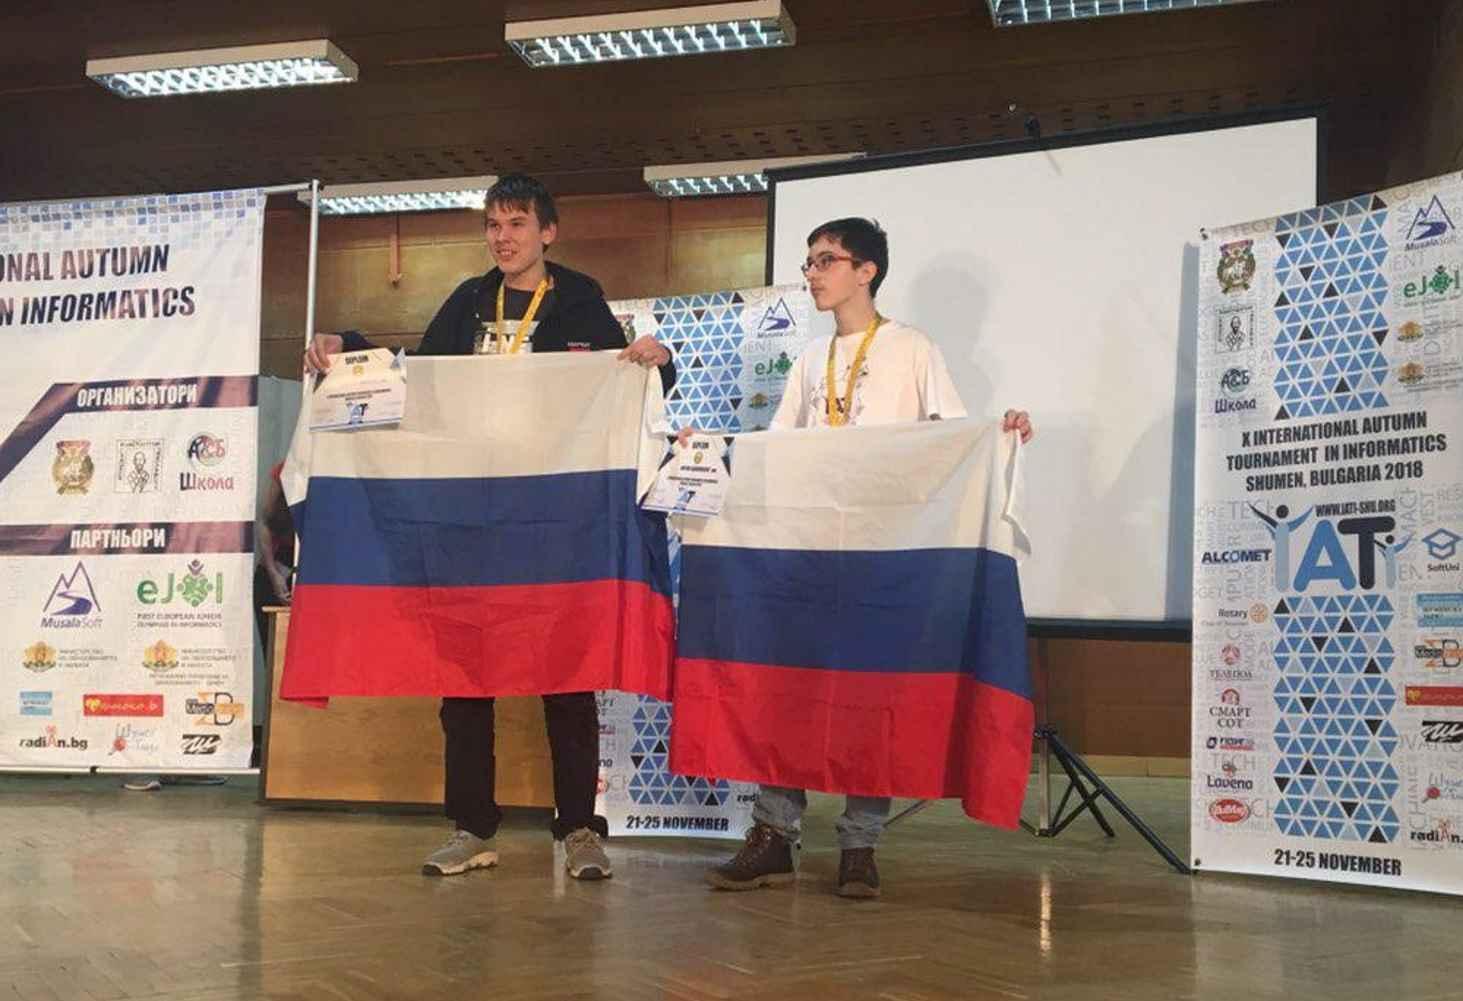 rossijskie-shkolniki-zavoevali-11-zolotyh-medalej-na-mezhdunarodnom-turnire-po-informatike